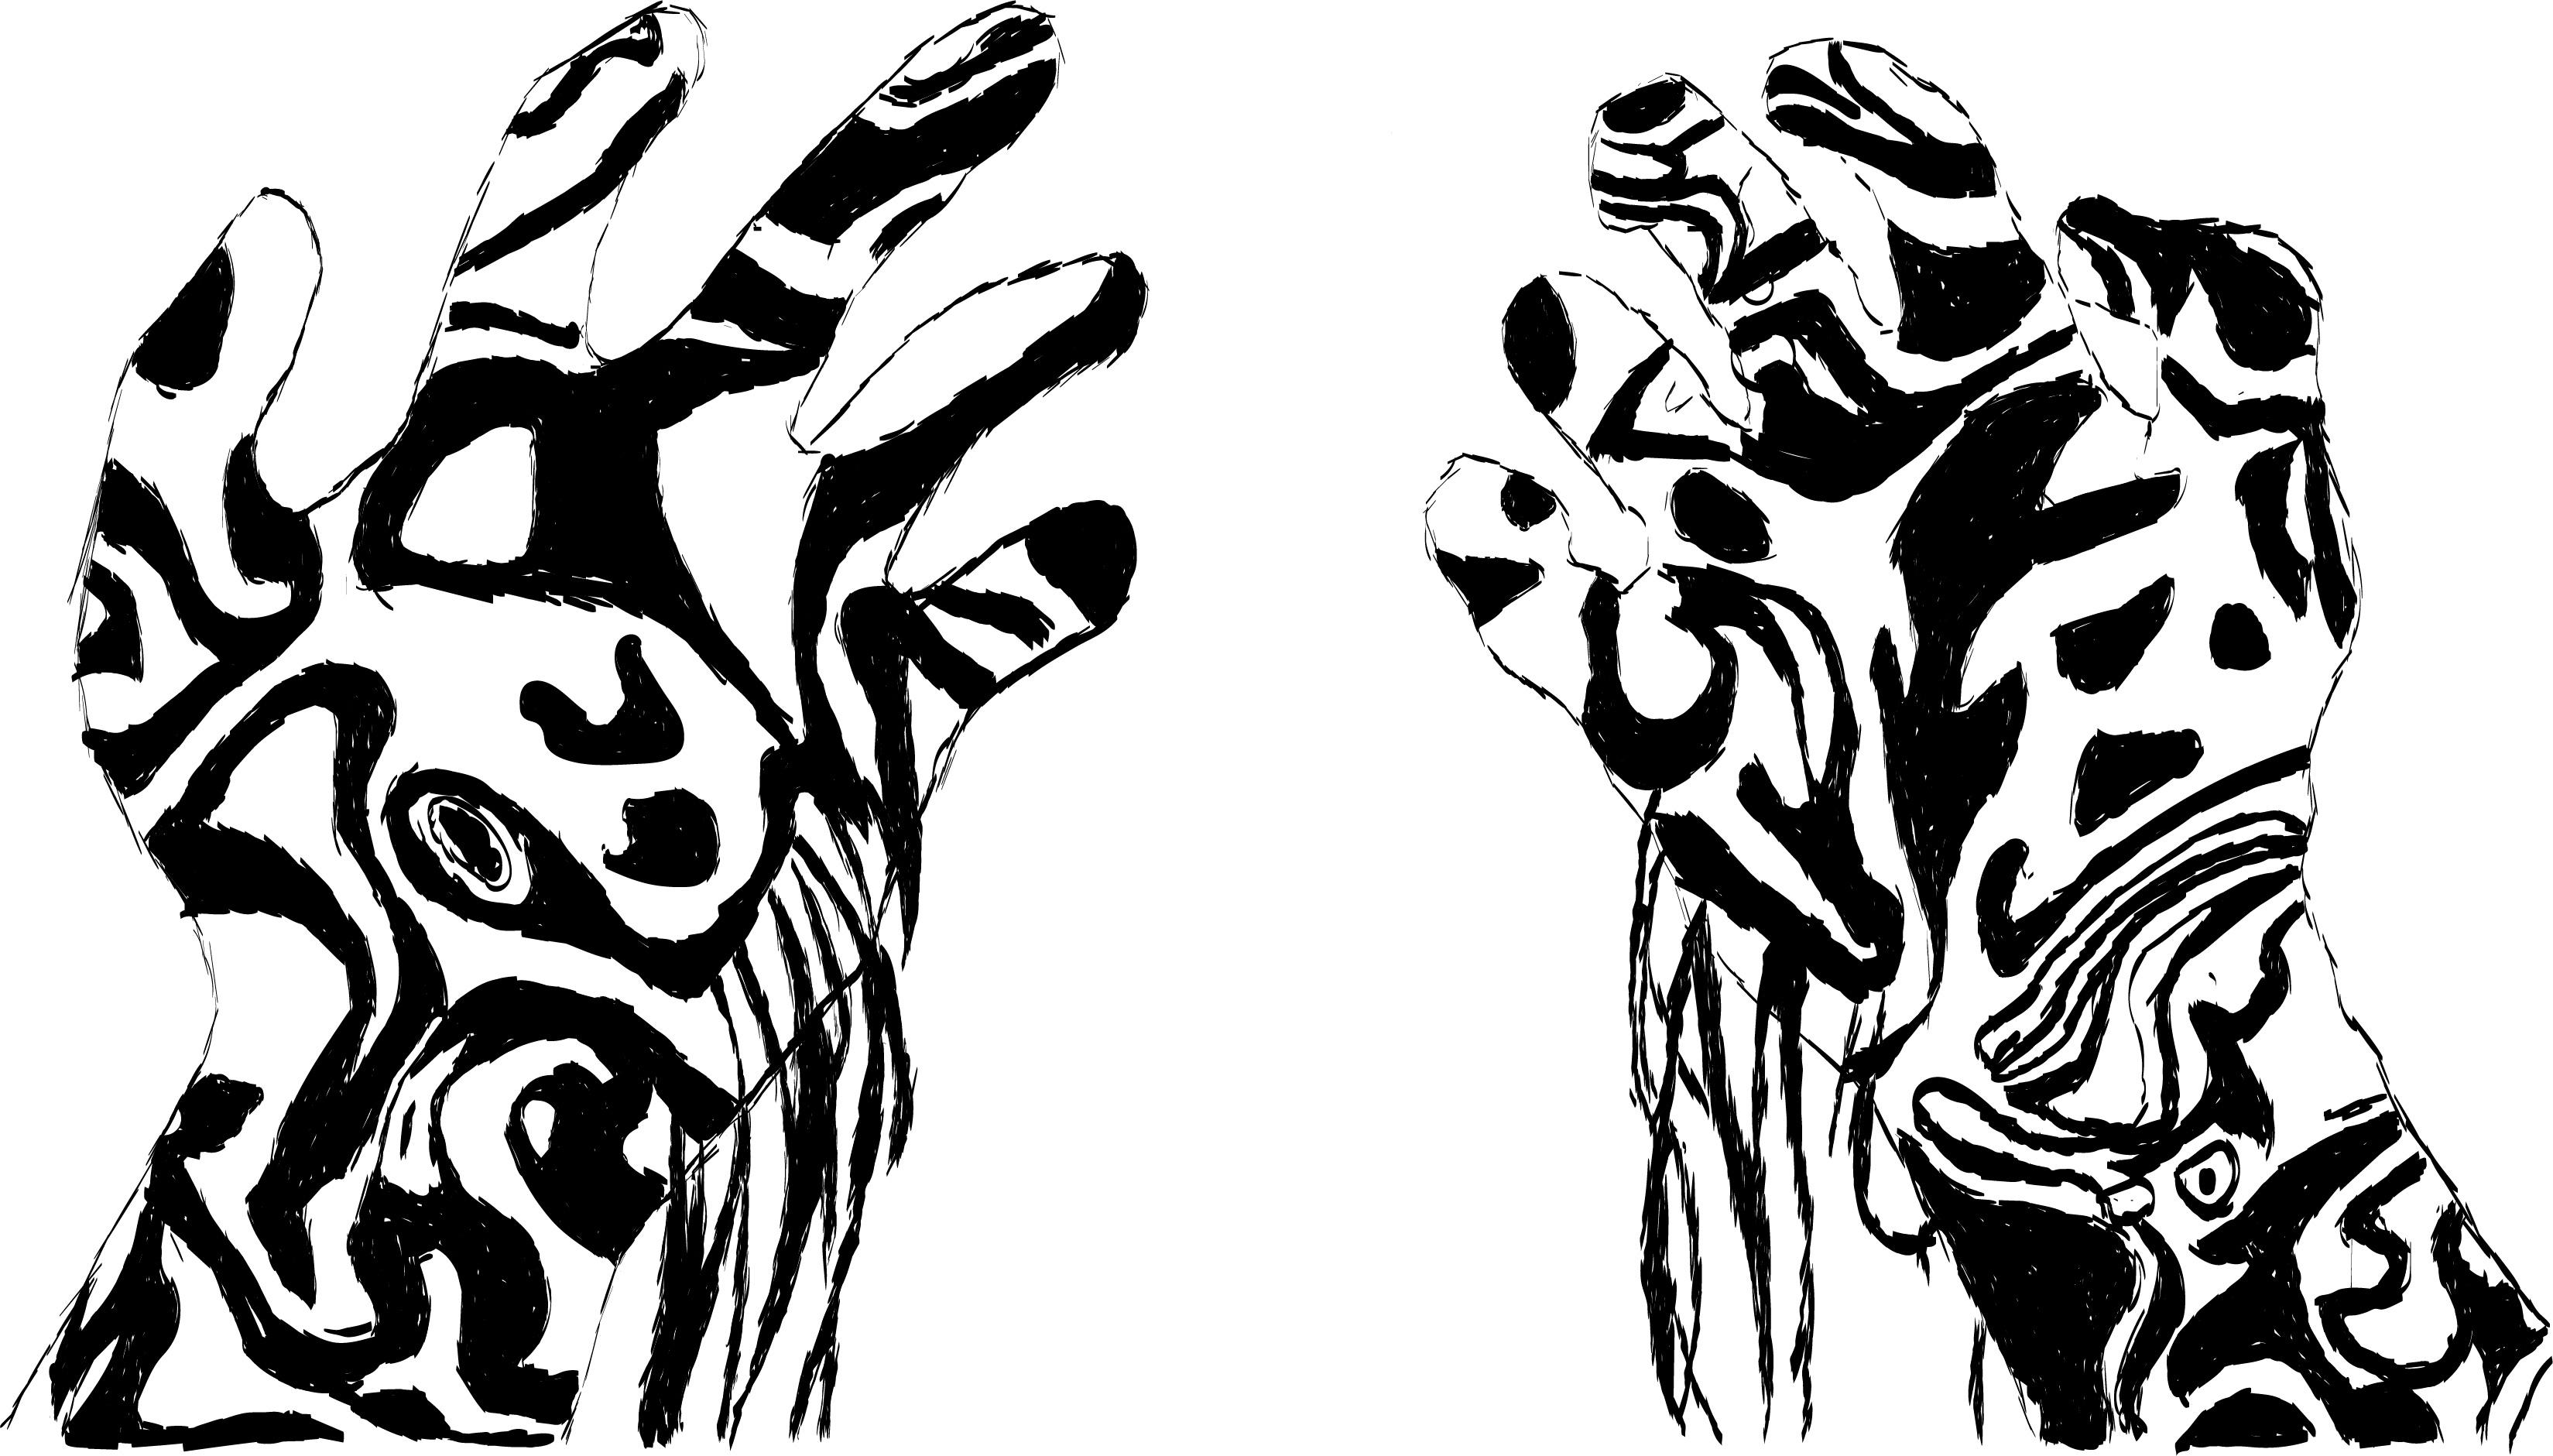 Distorted Hands spilling some kind of liquid